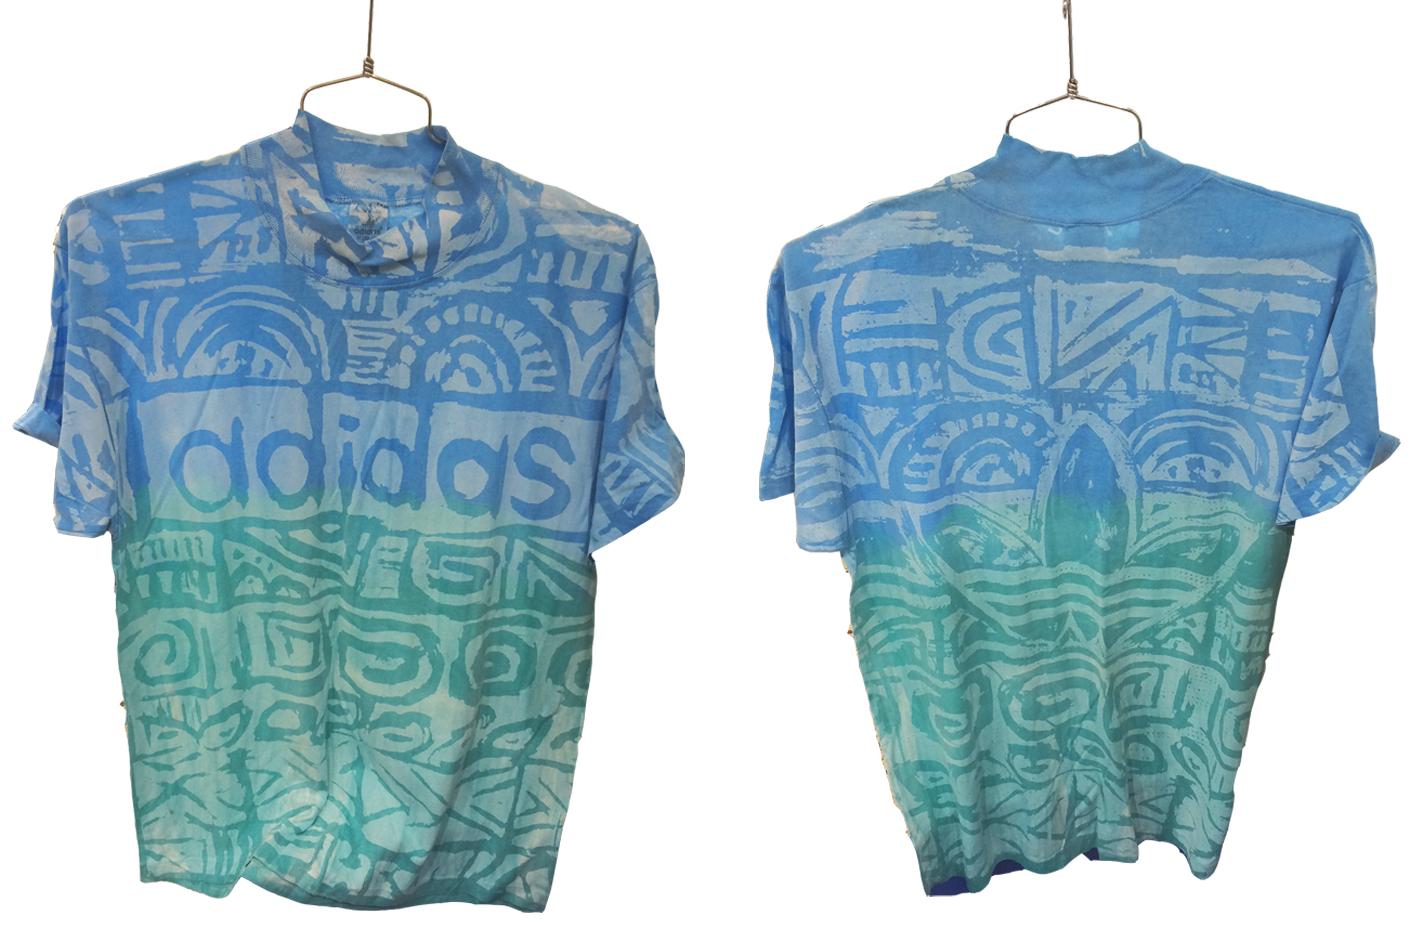 00_original_shirt.jpg